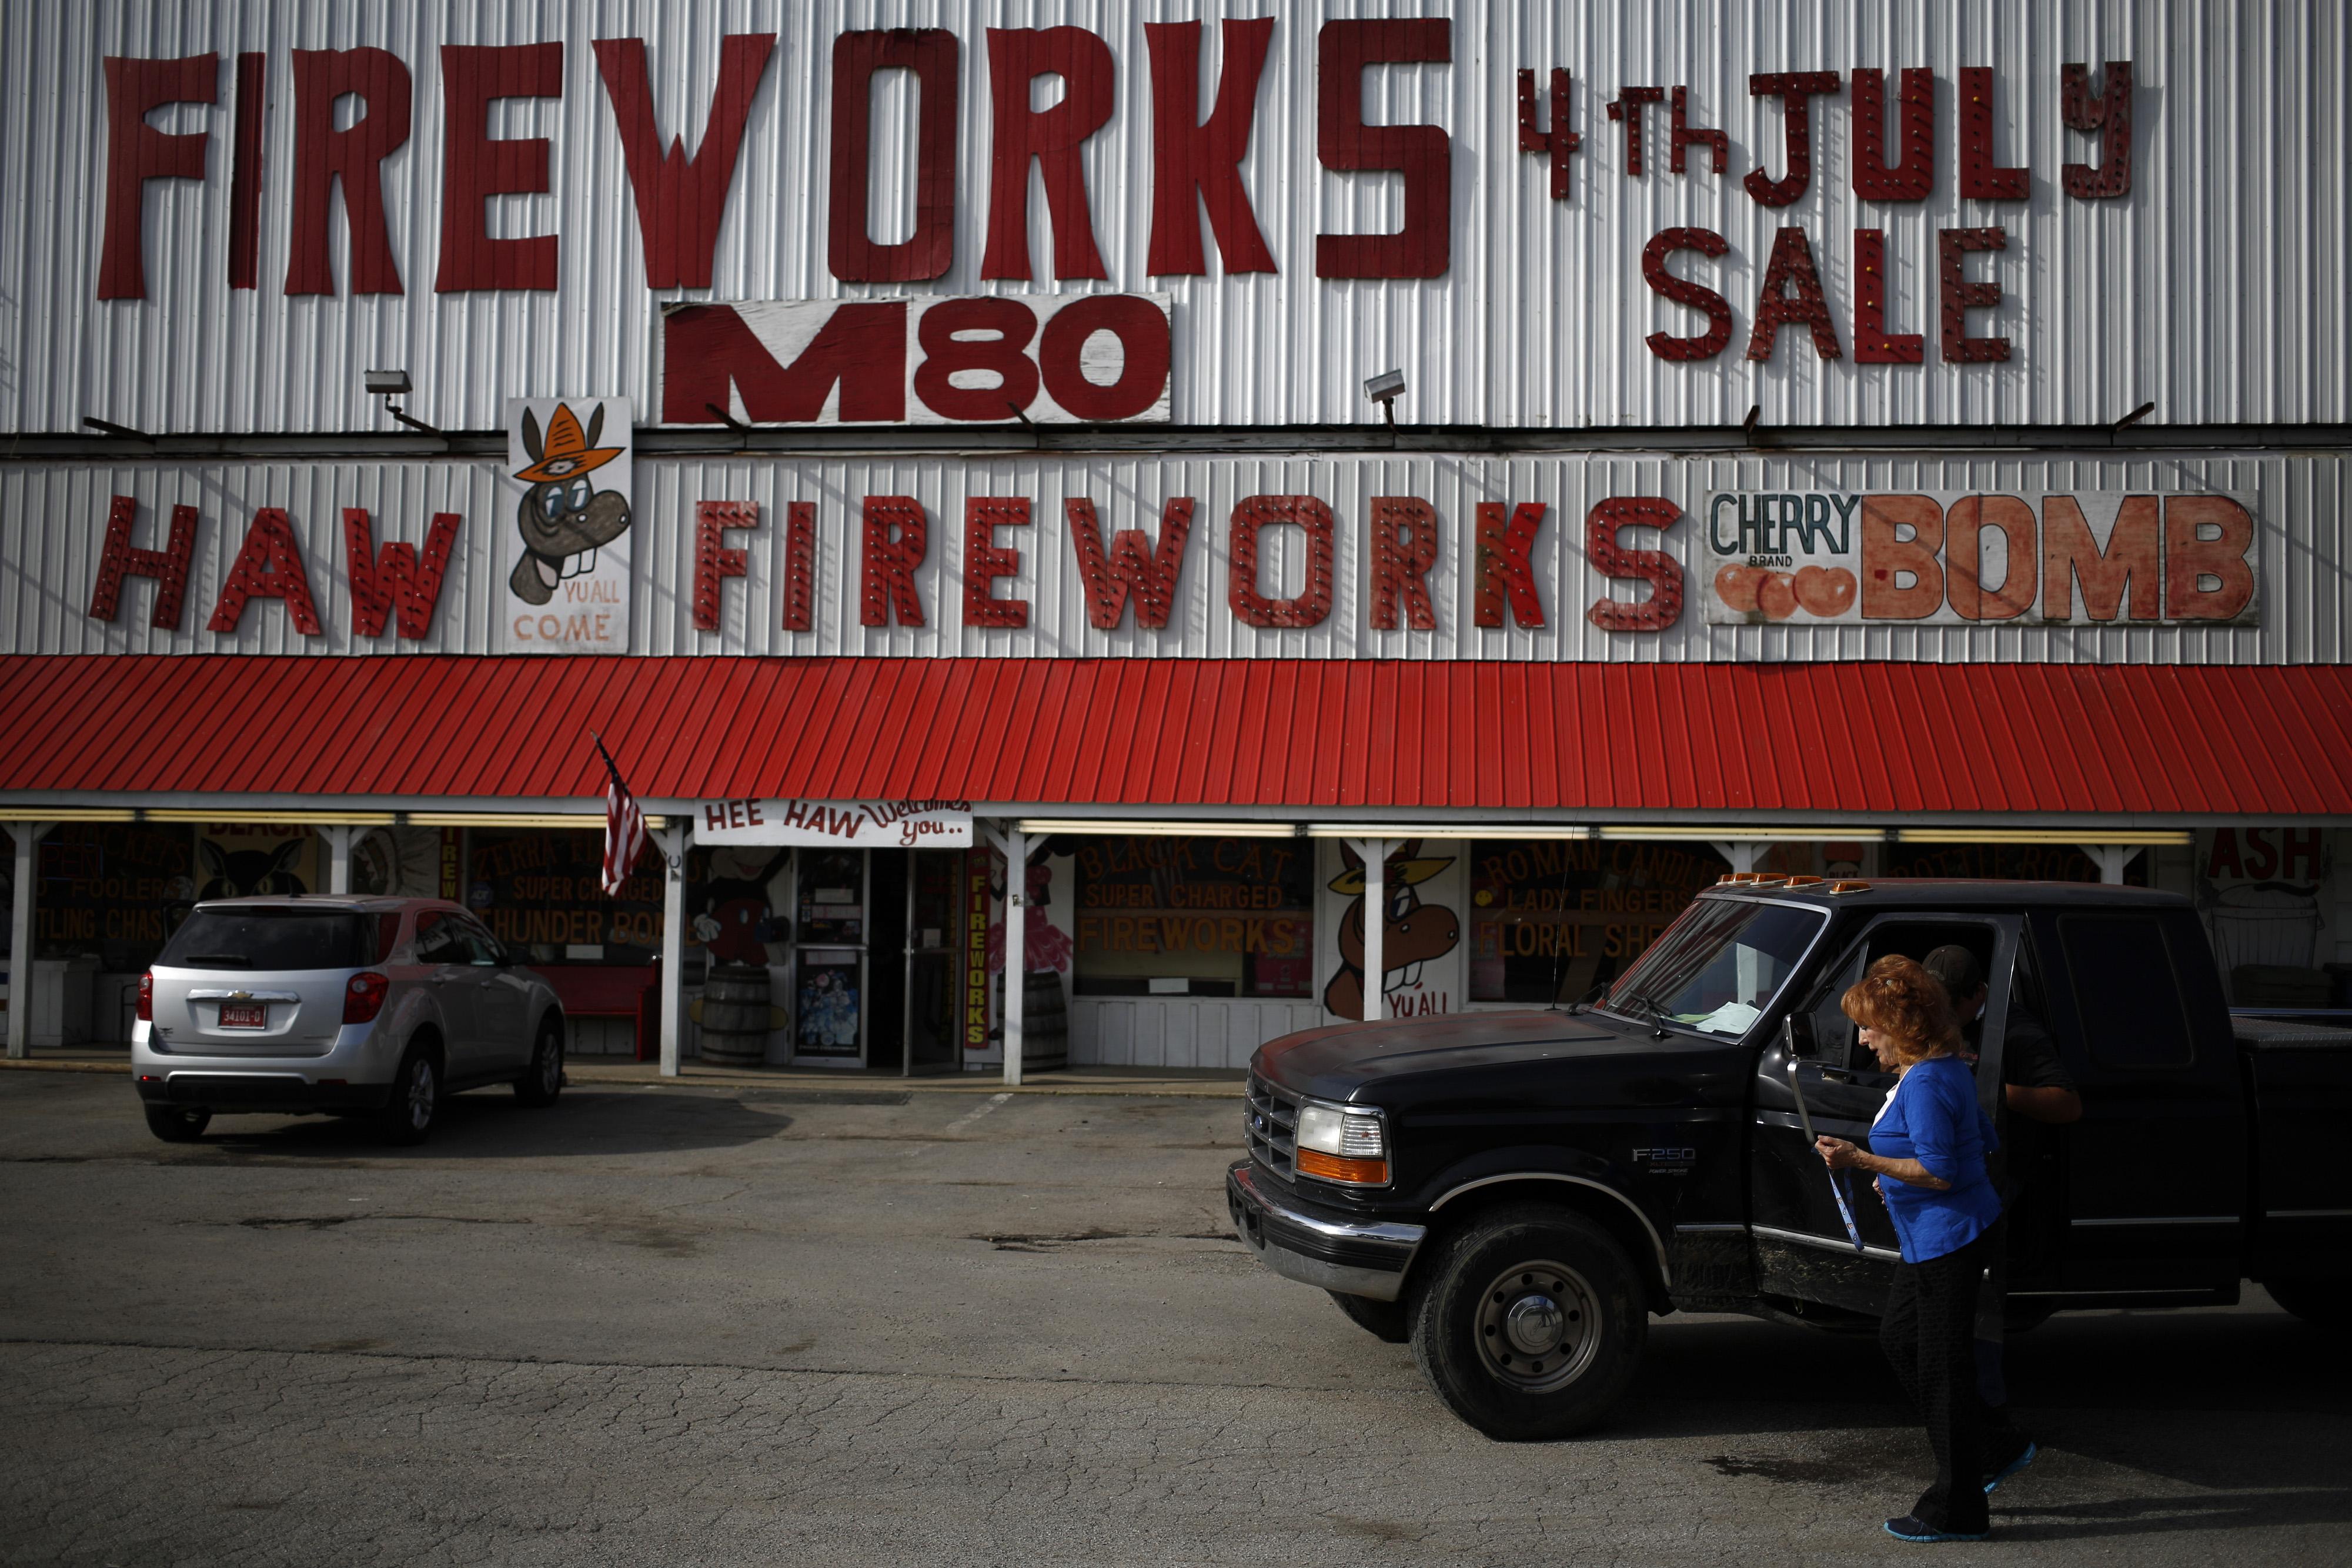 Owner Glenda Tinnin stands in front of Hee Haw Fireworks in Goodlettsville, Tenn. on July 1, 2014.